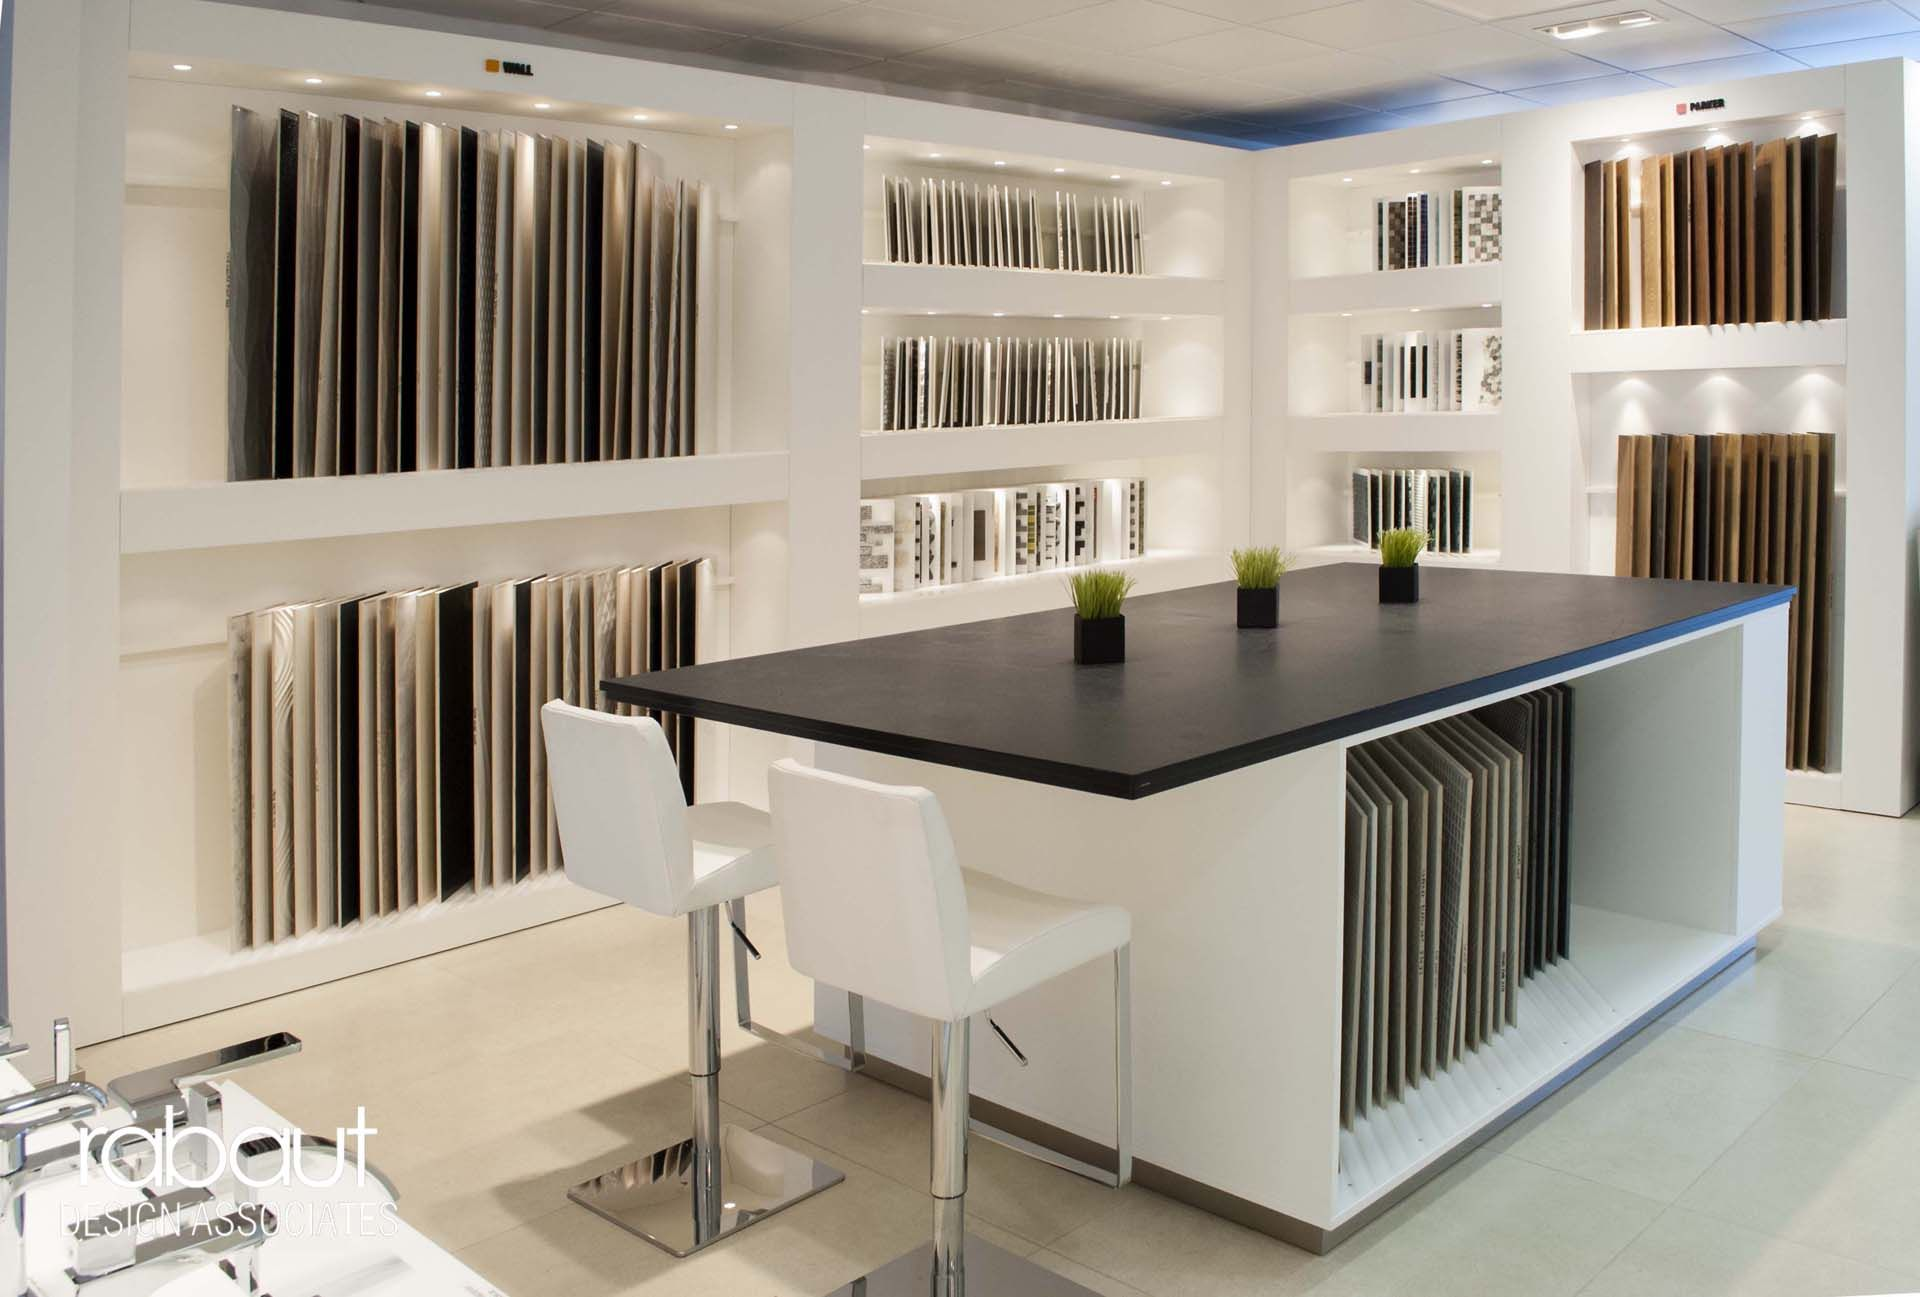 Porcelanosa Kitchen Cabinets Porcelanosa Showroom By Rabaut Design Associates Porcelanosa